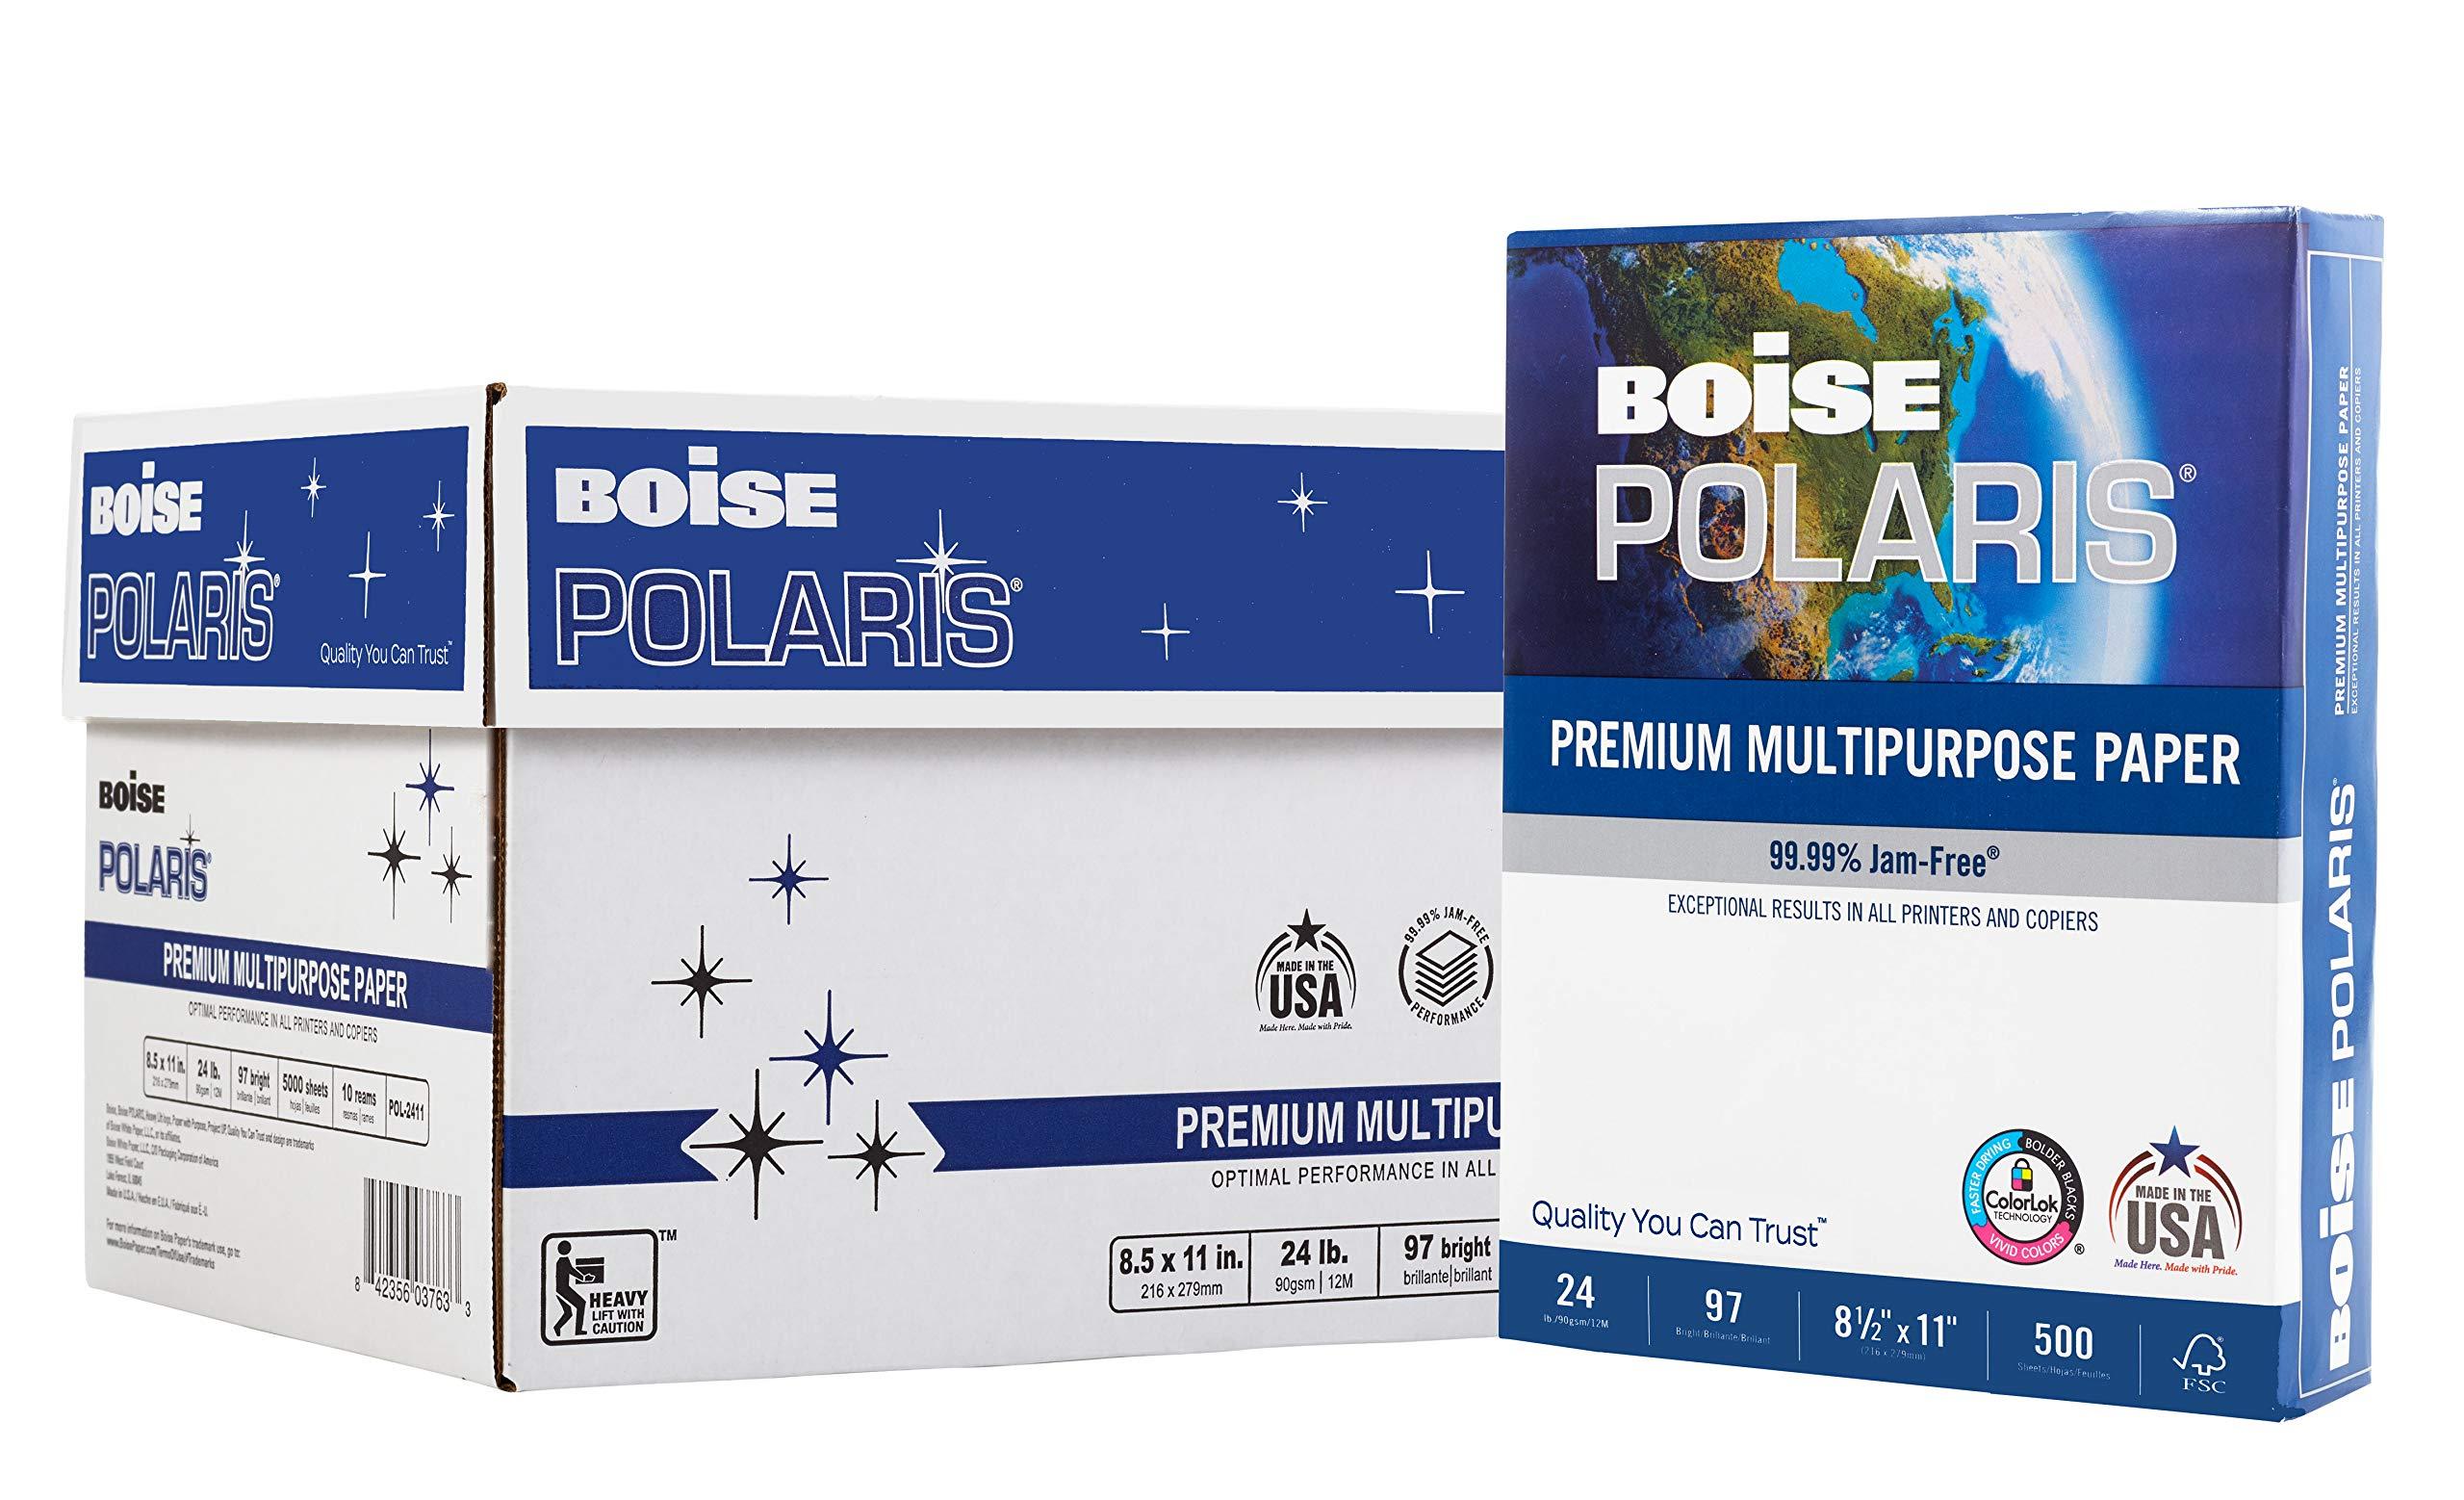 BOISE POLARIS Premium Multipurpose Paper, 8.5 x 11, 97 Bright White, 24 lb, 10 ream carton (5,000 Sheets) by Boise Paper